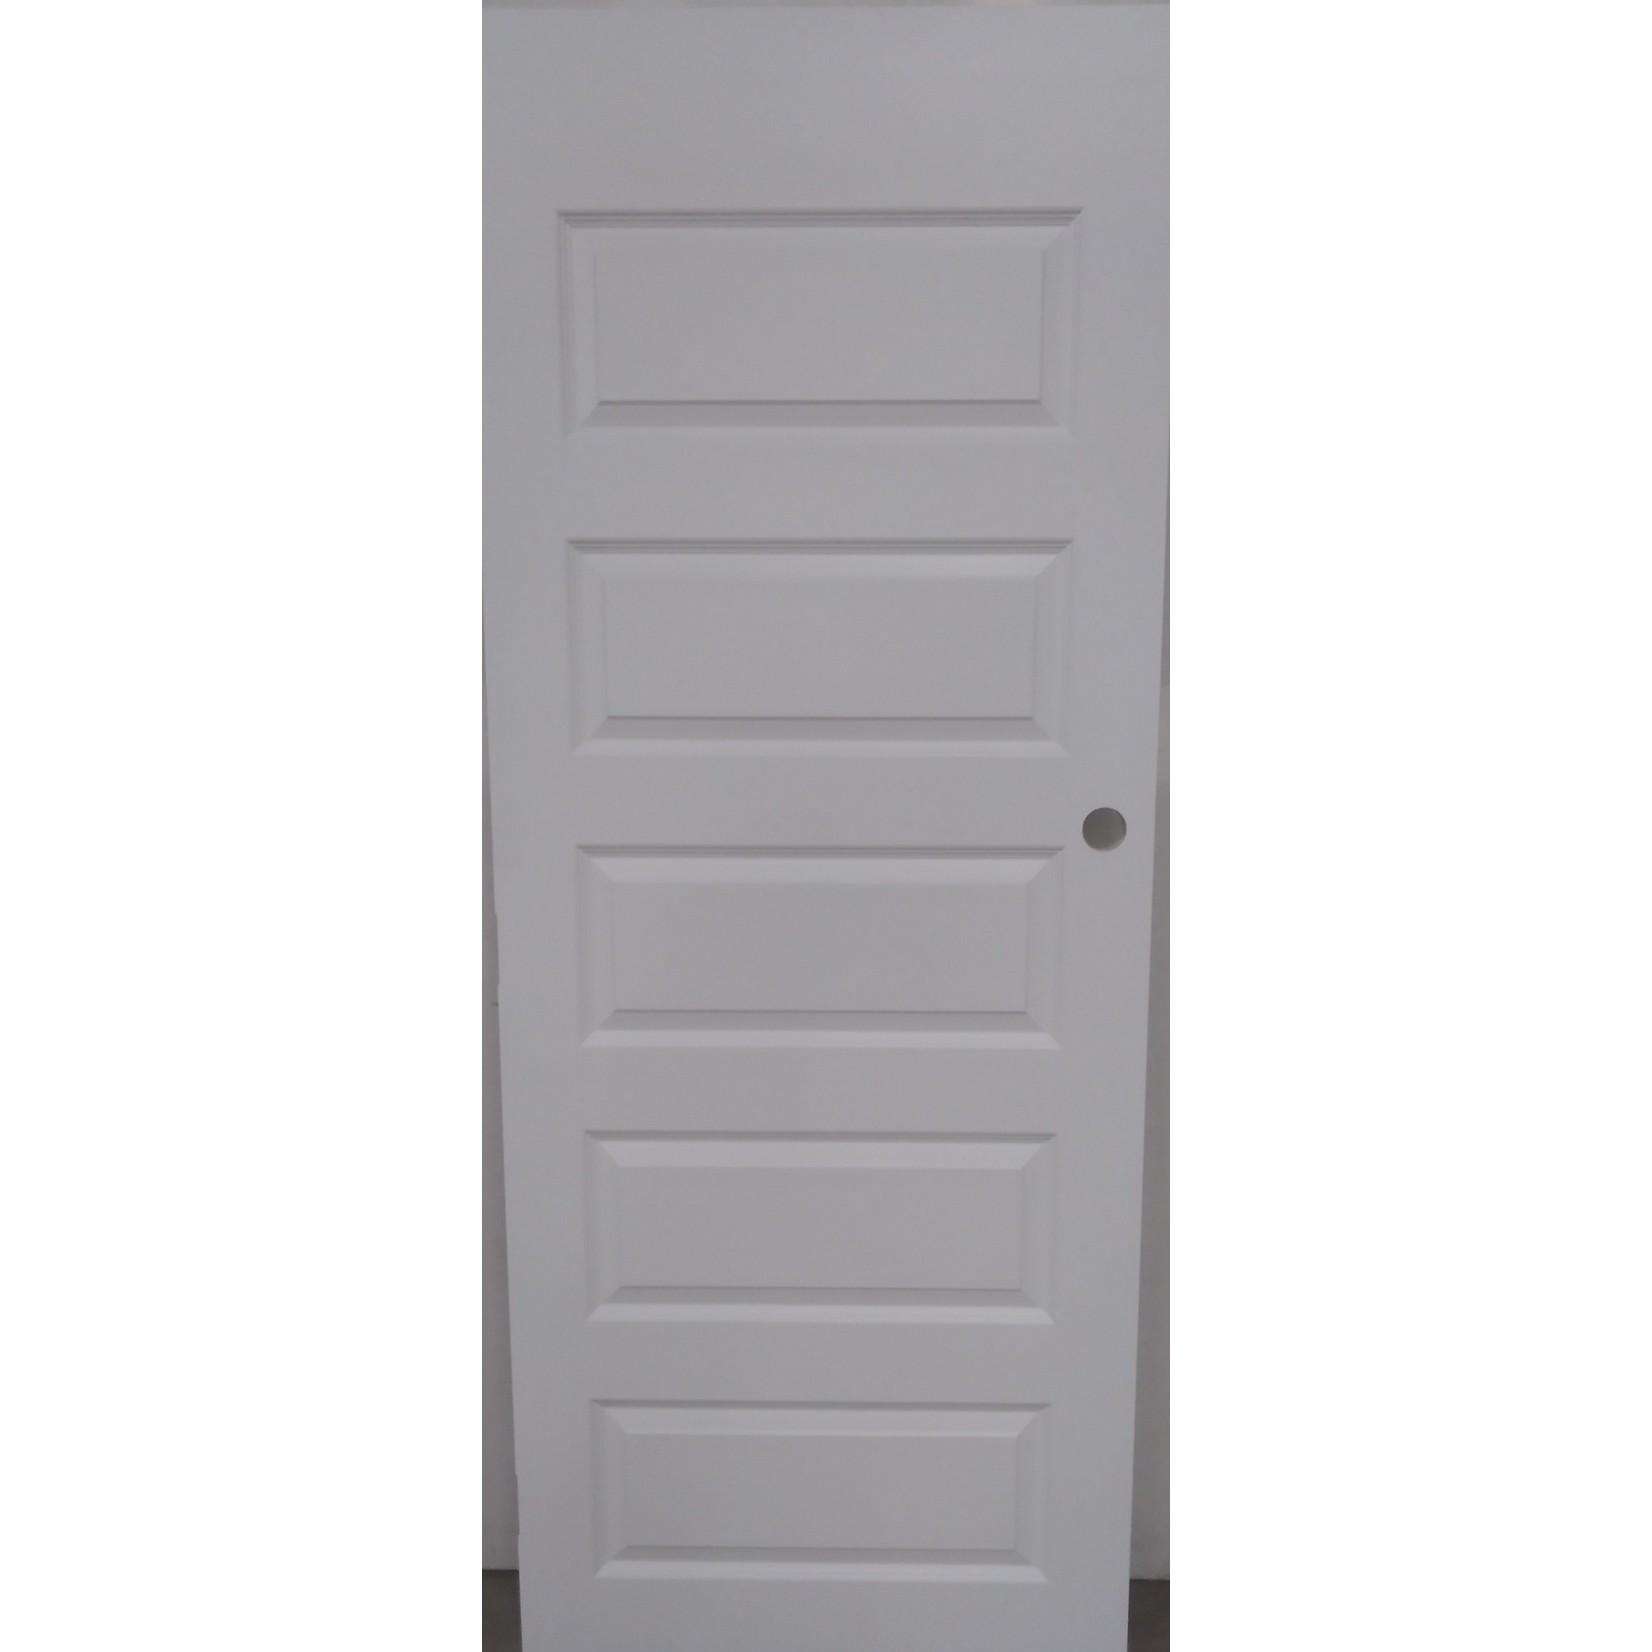 10464 White 5-Panel Interior Door